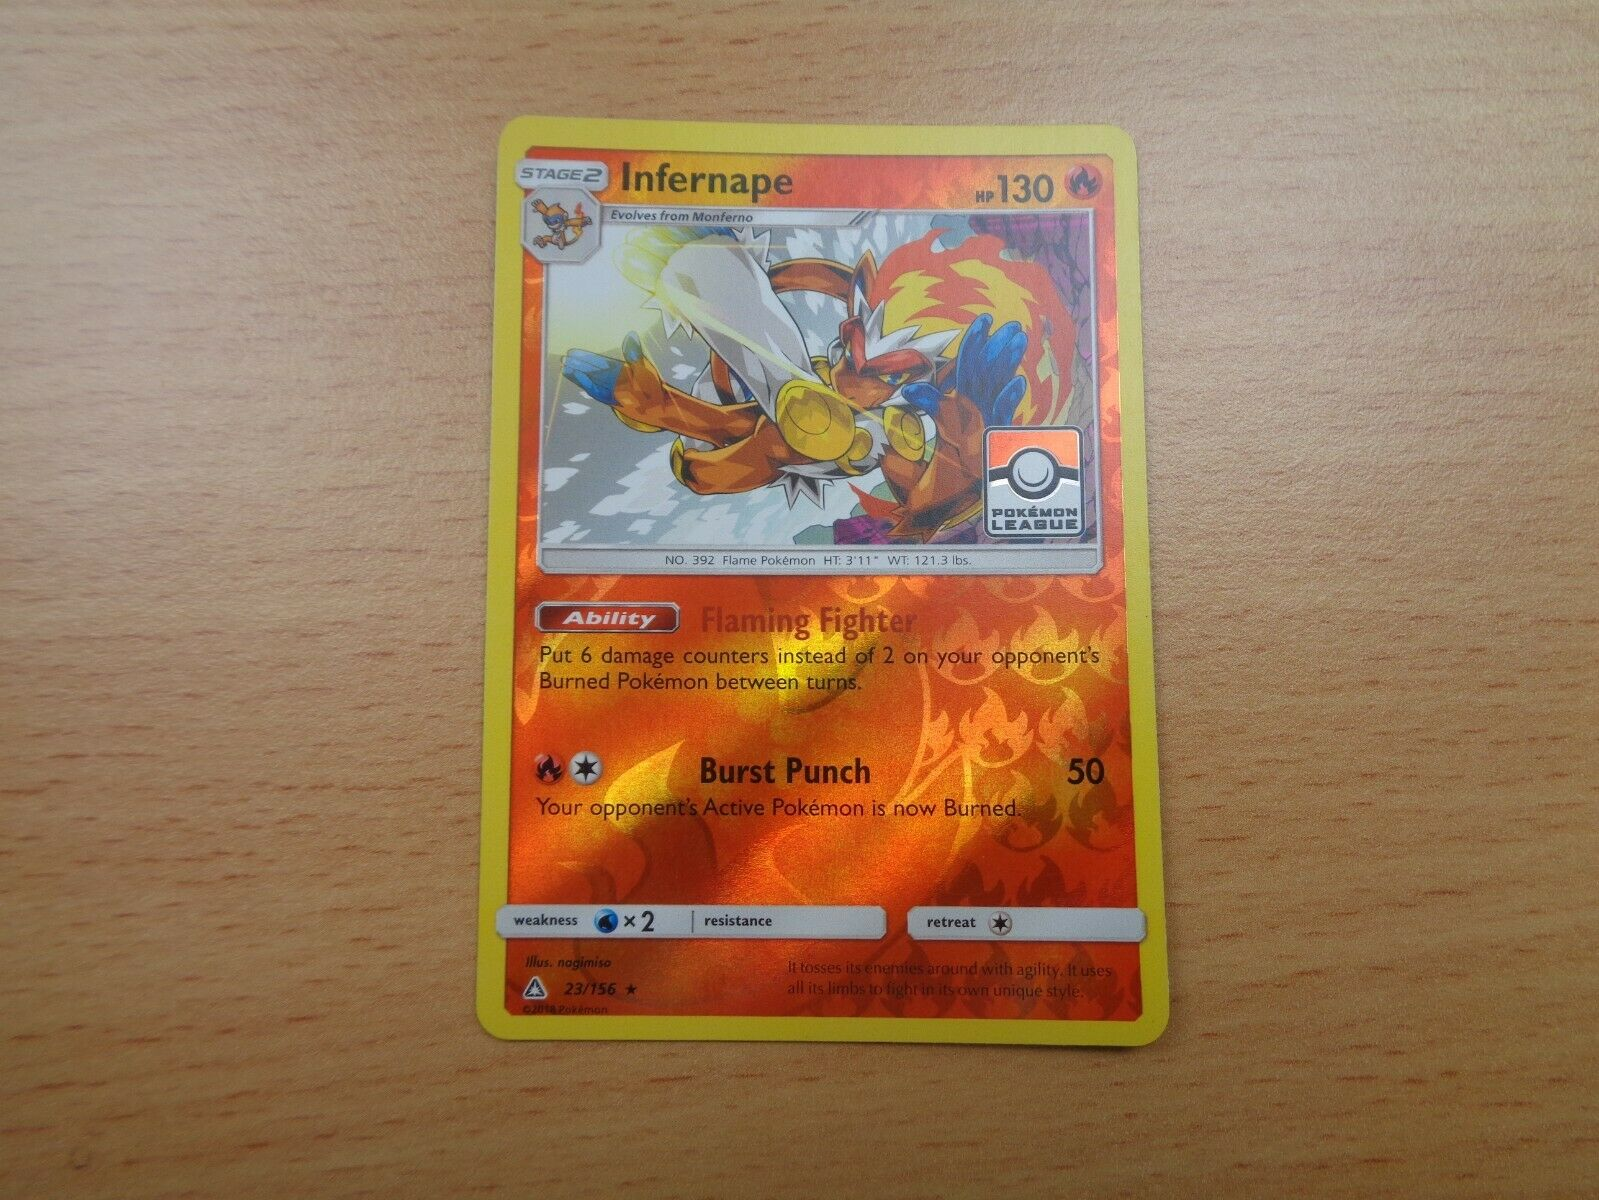 Infernape (23/156) RARE REVERSE HOLO POKEMON LEAGUE PROMO Card, Ultra Prism - Image 1